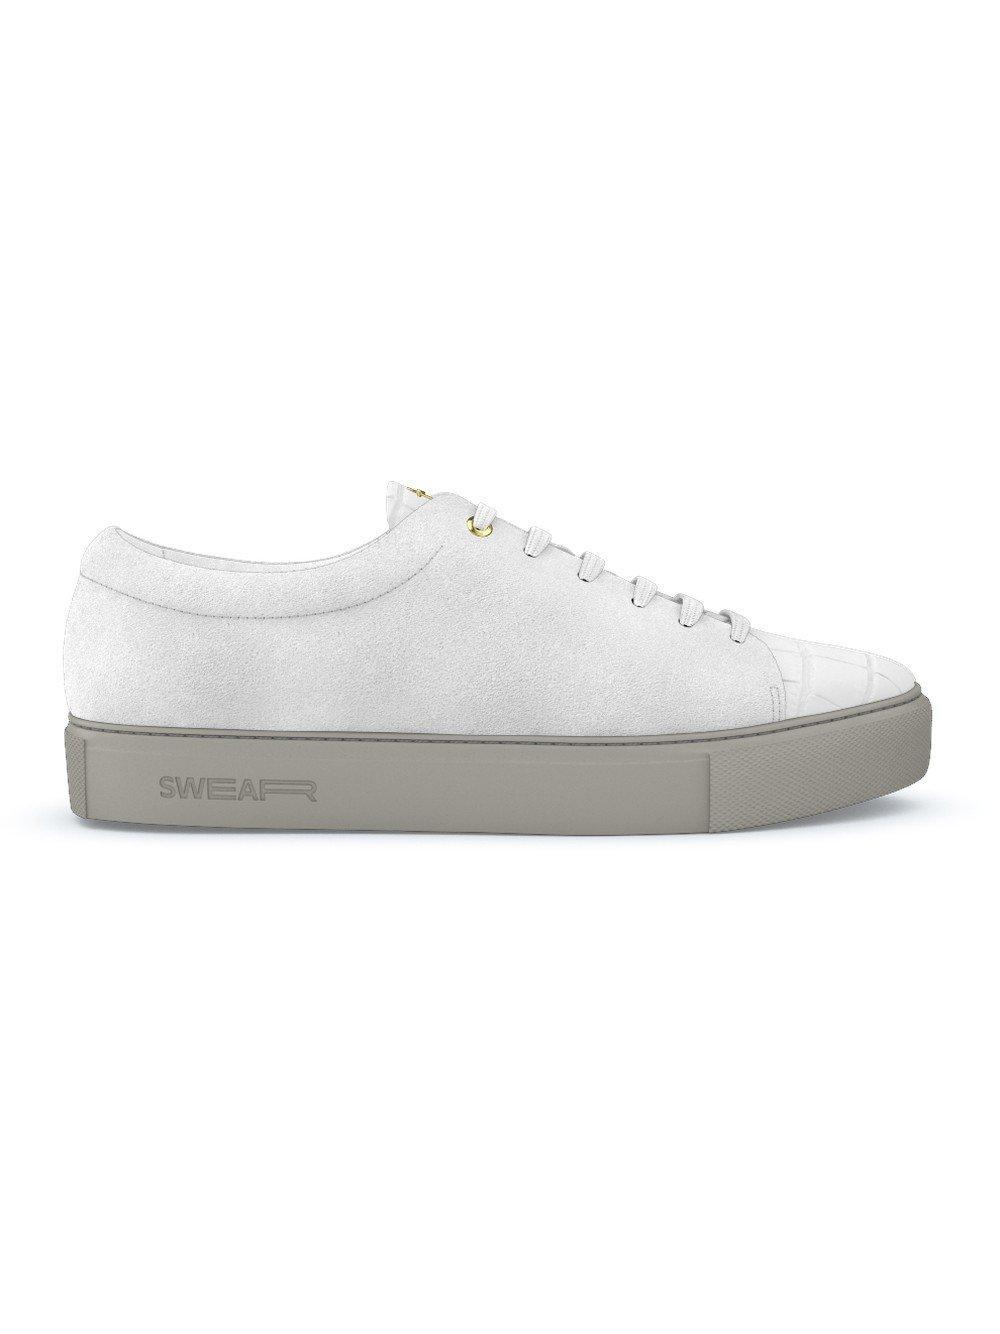 Swear Vyner Sneakers In White